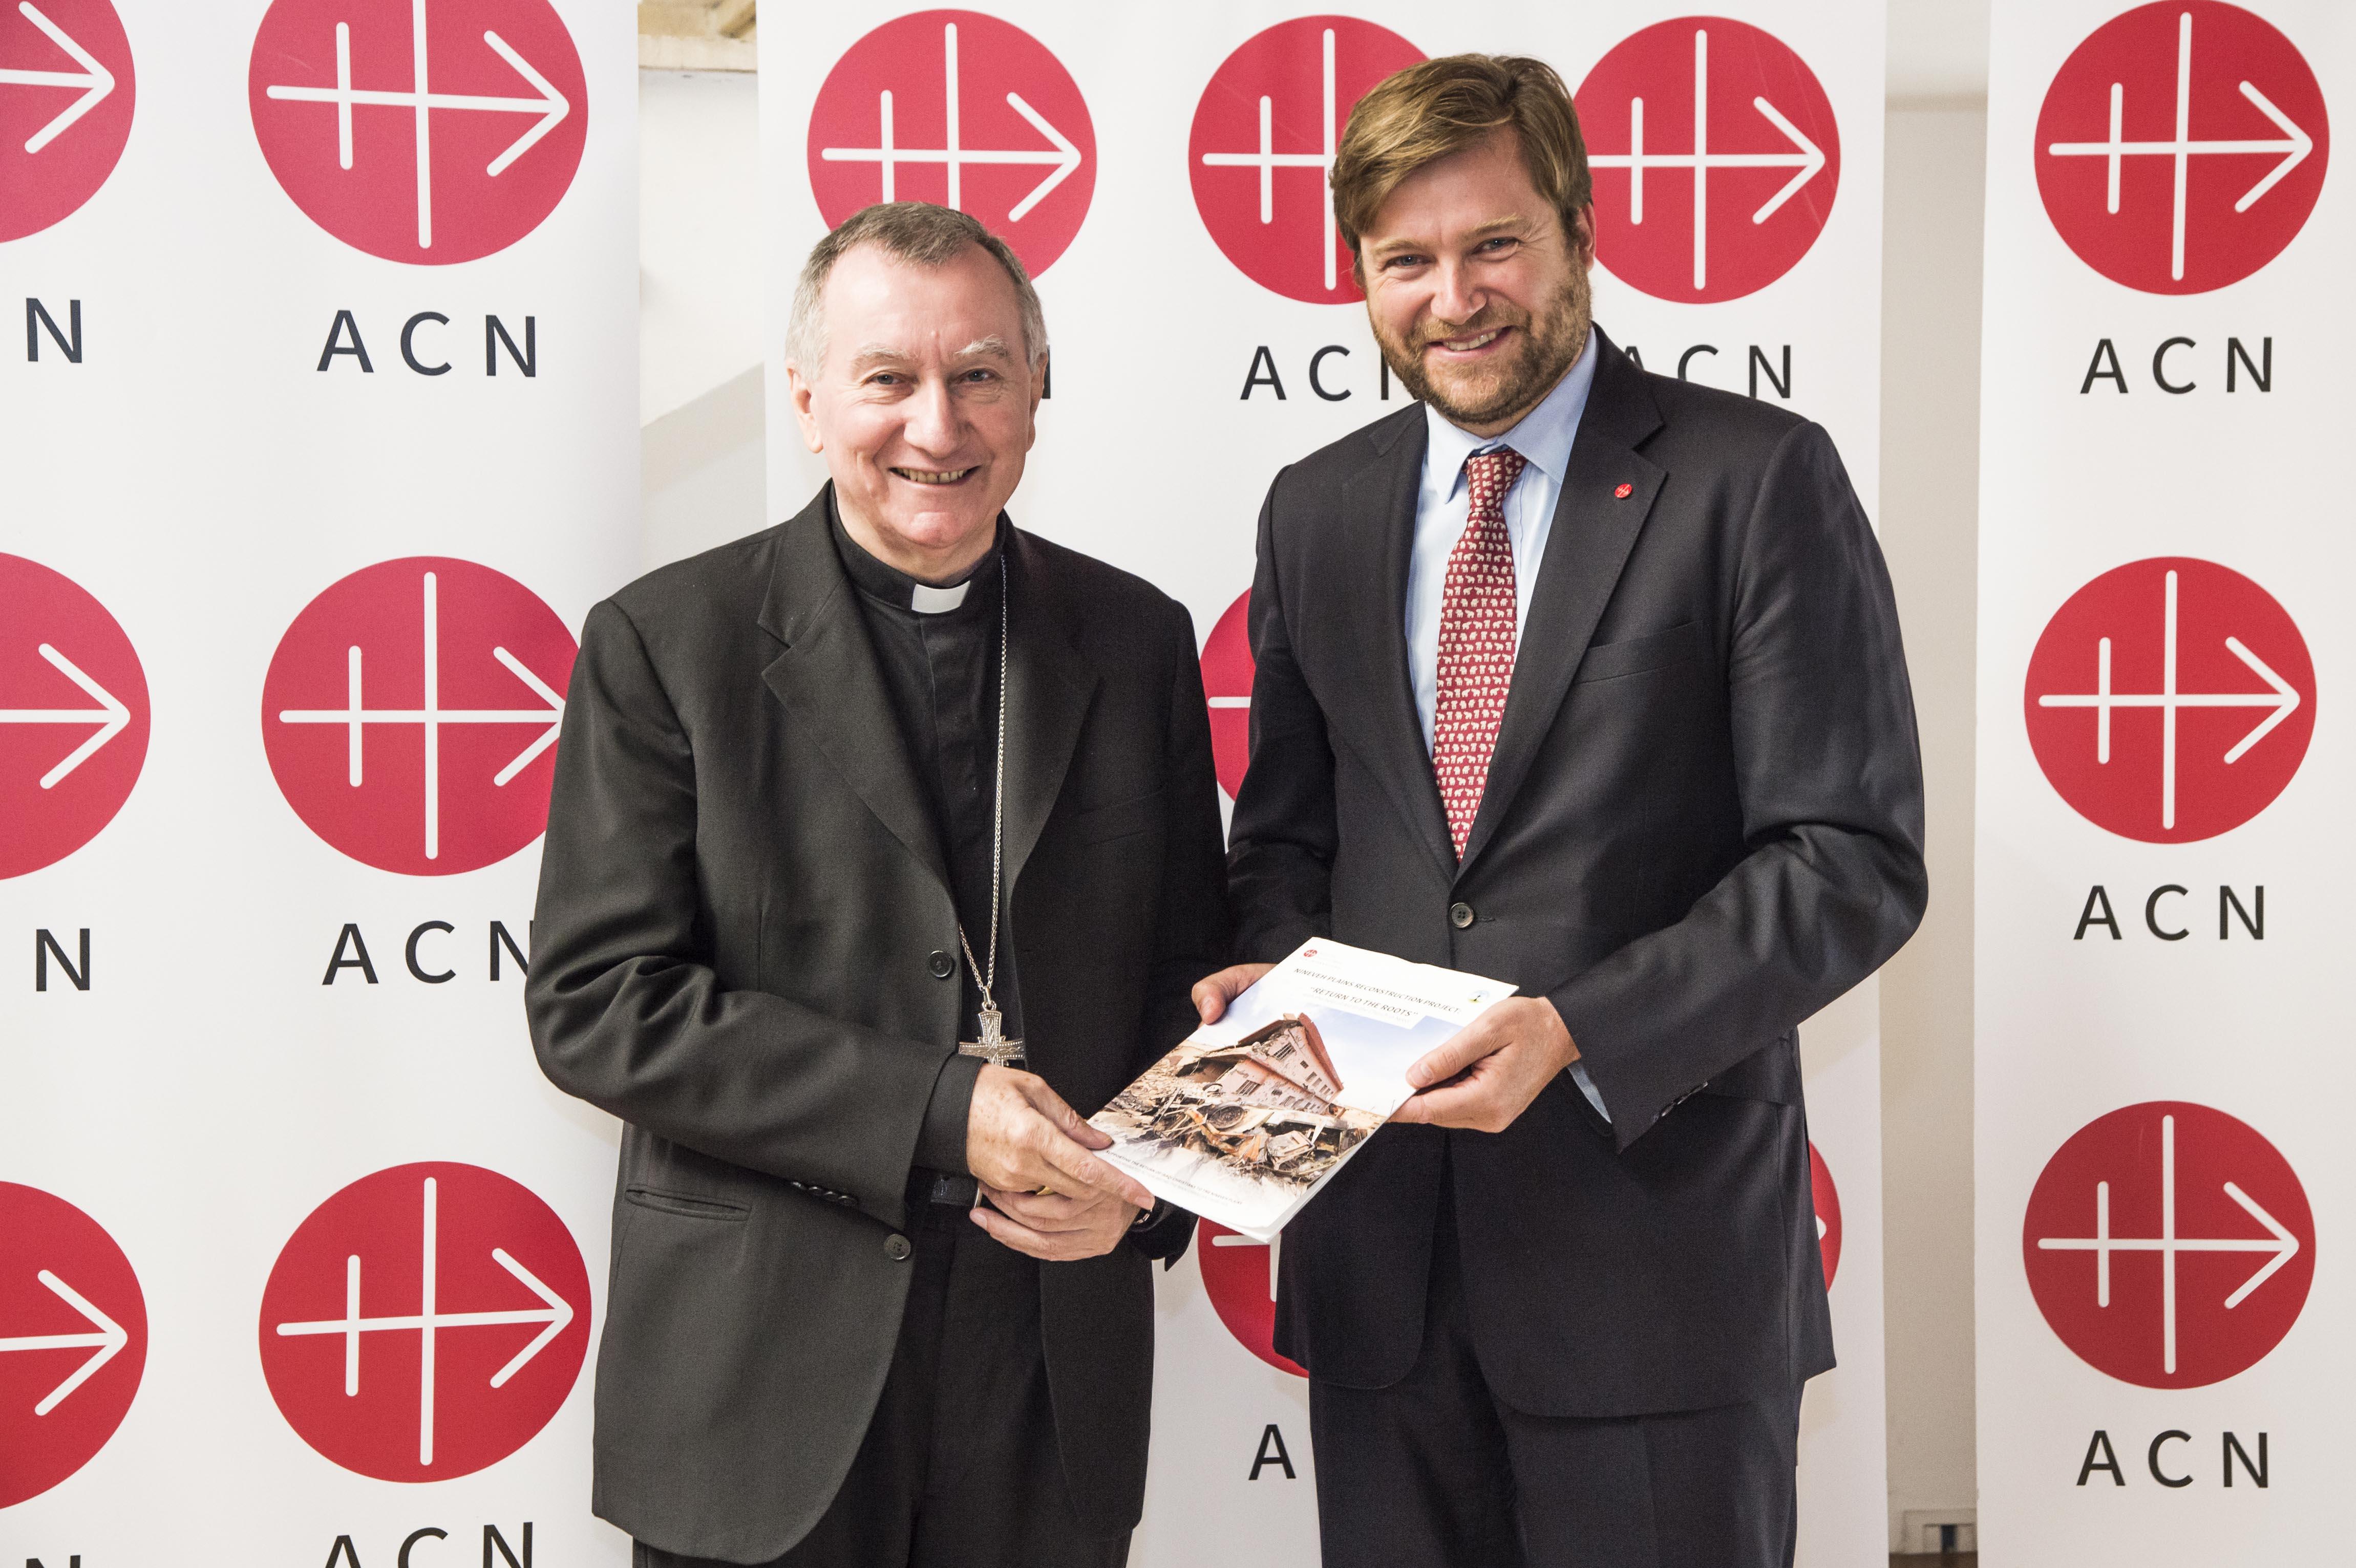 Vatican Secretary of State Cardinal Pietro Parolin with ACN's international general secretary Philipp Ozores